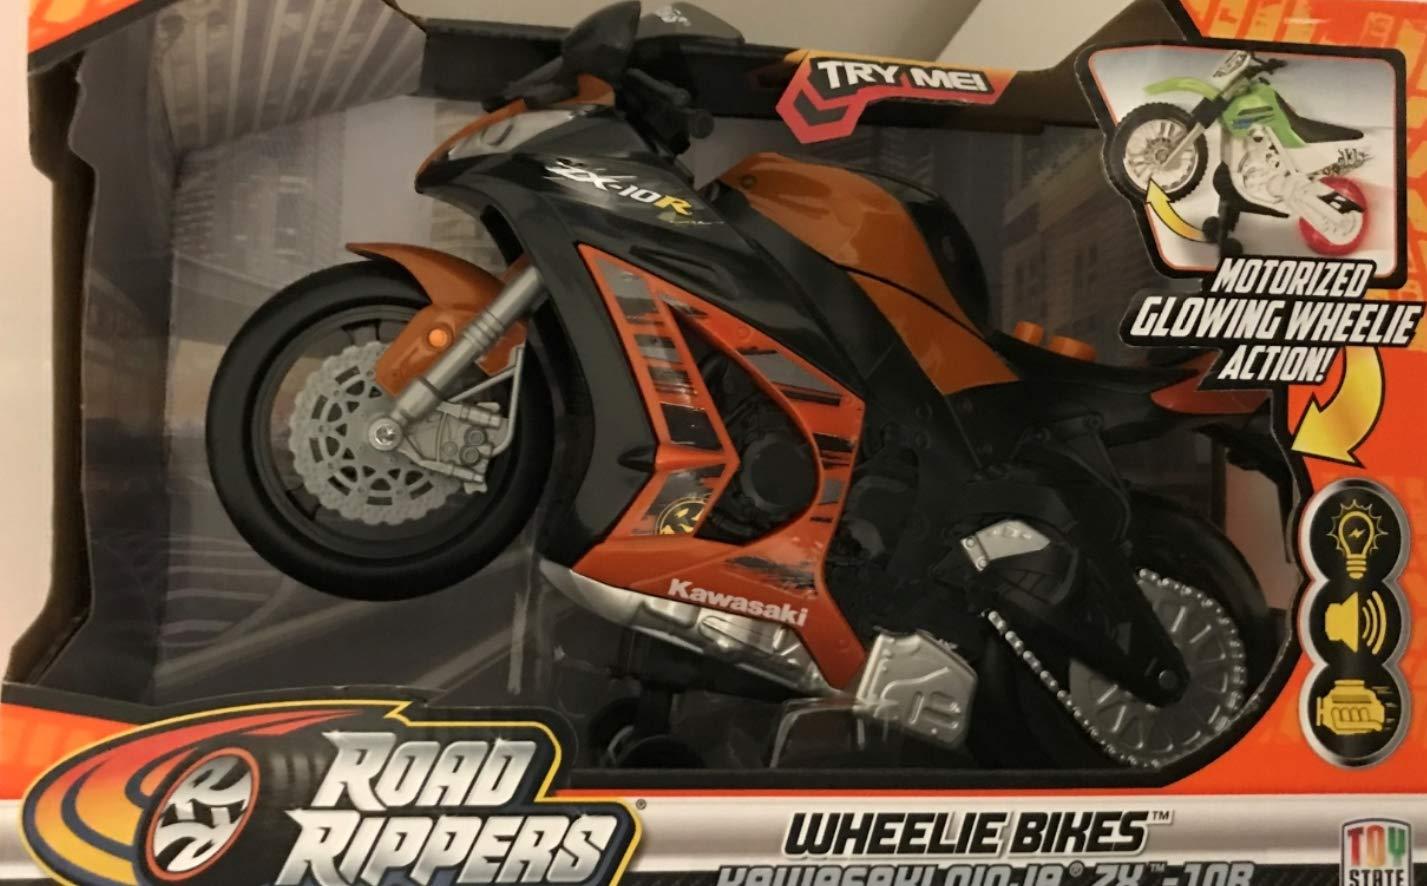 Amazon.com: Toy State Road Rippers Wheelie Bikes Kawasaki ...